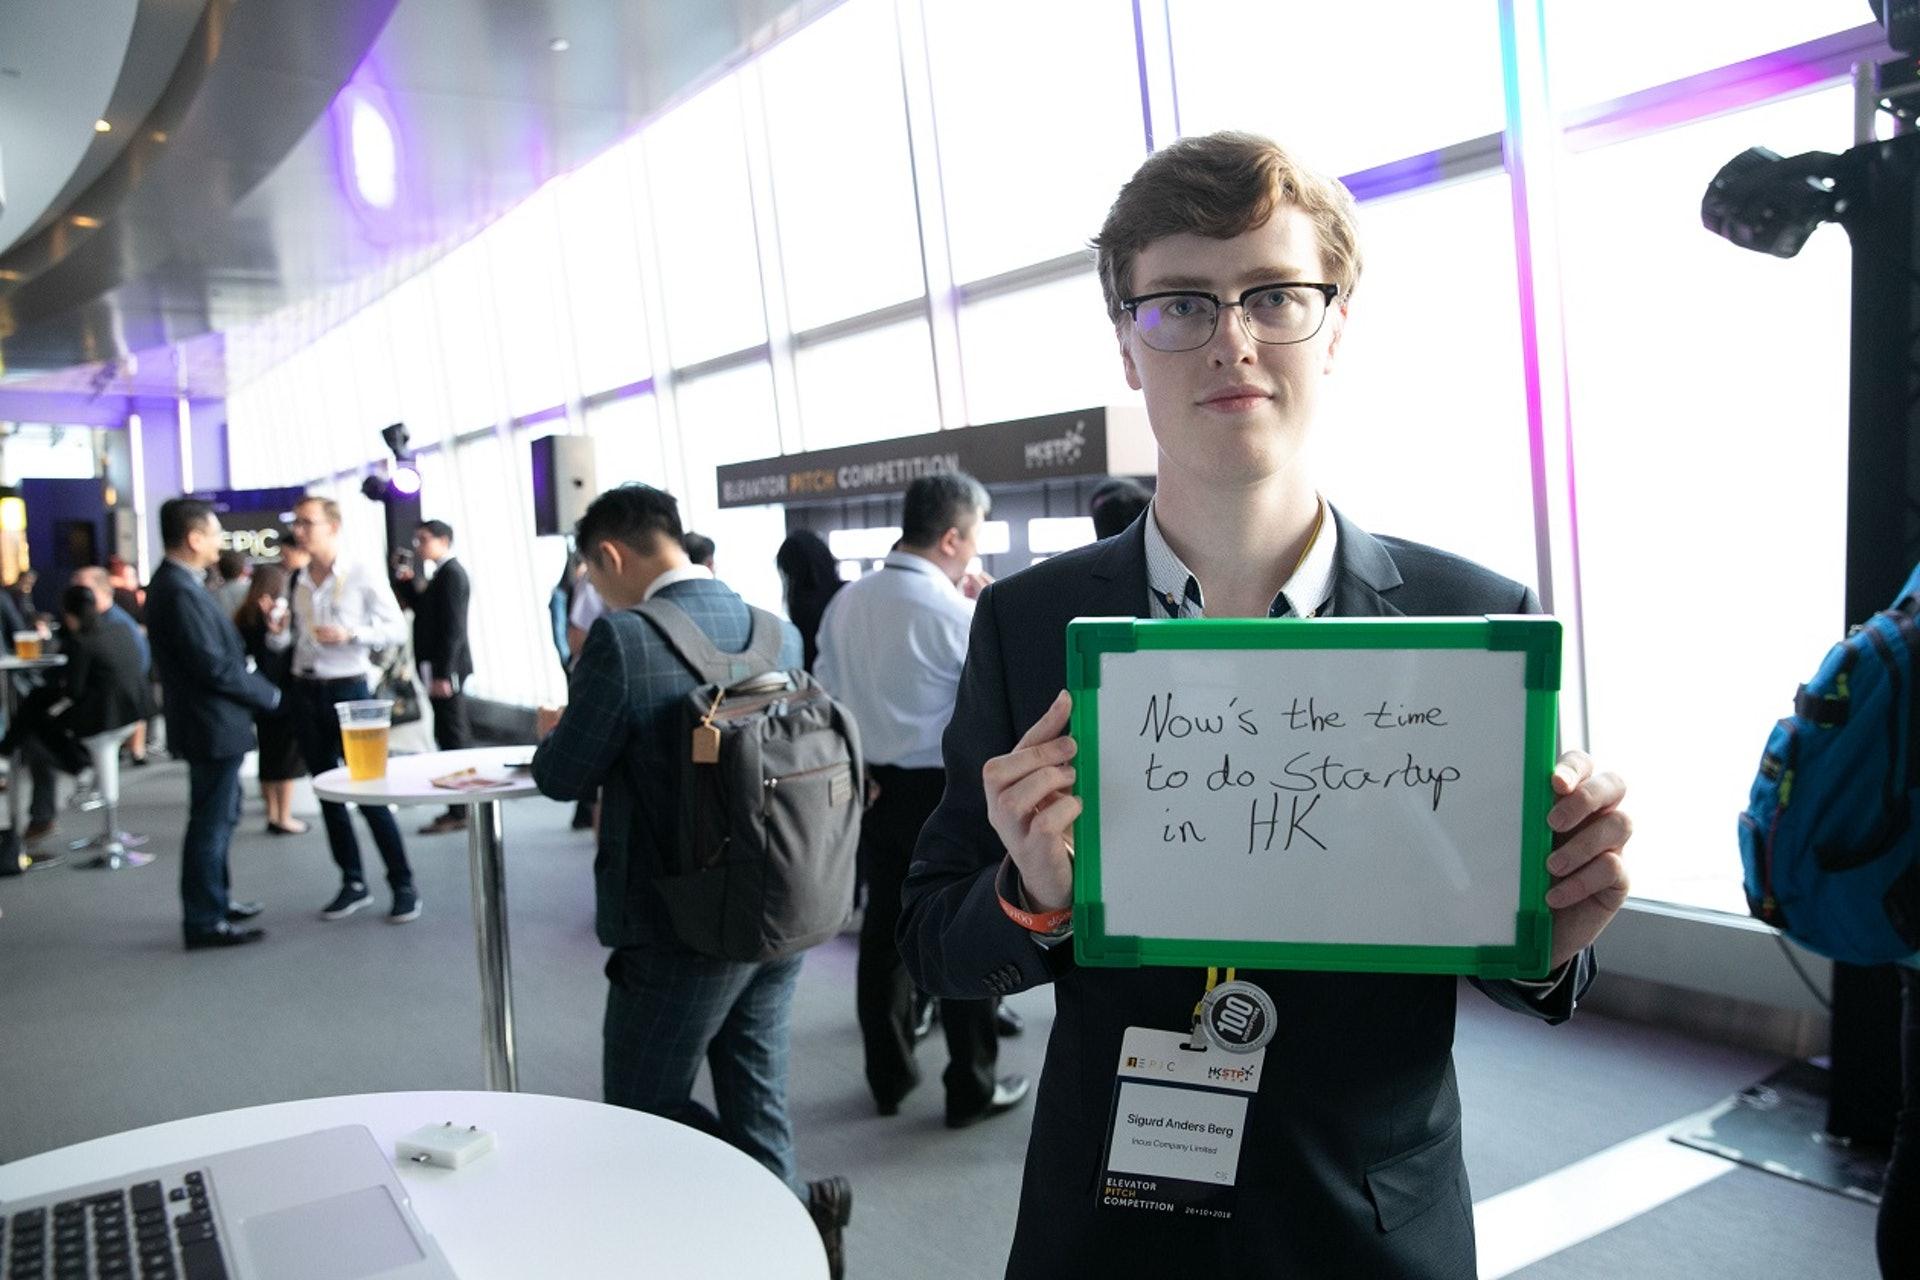 【Now's the time to do startup in HK】創企Incus的軟件工程師Sigurd Anders Berg用了一整句話來形容今天的香港創科生態圈,因為他覺得在時機、技術、支援上,香港的創業配套已有着不錯準備。